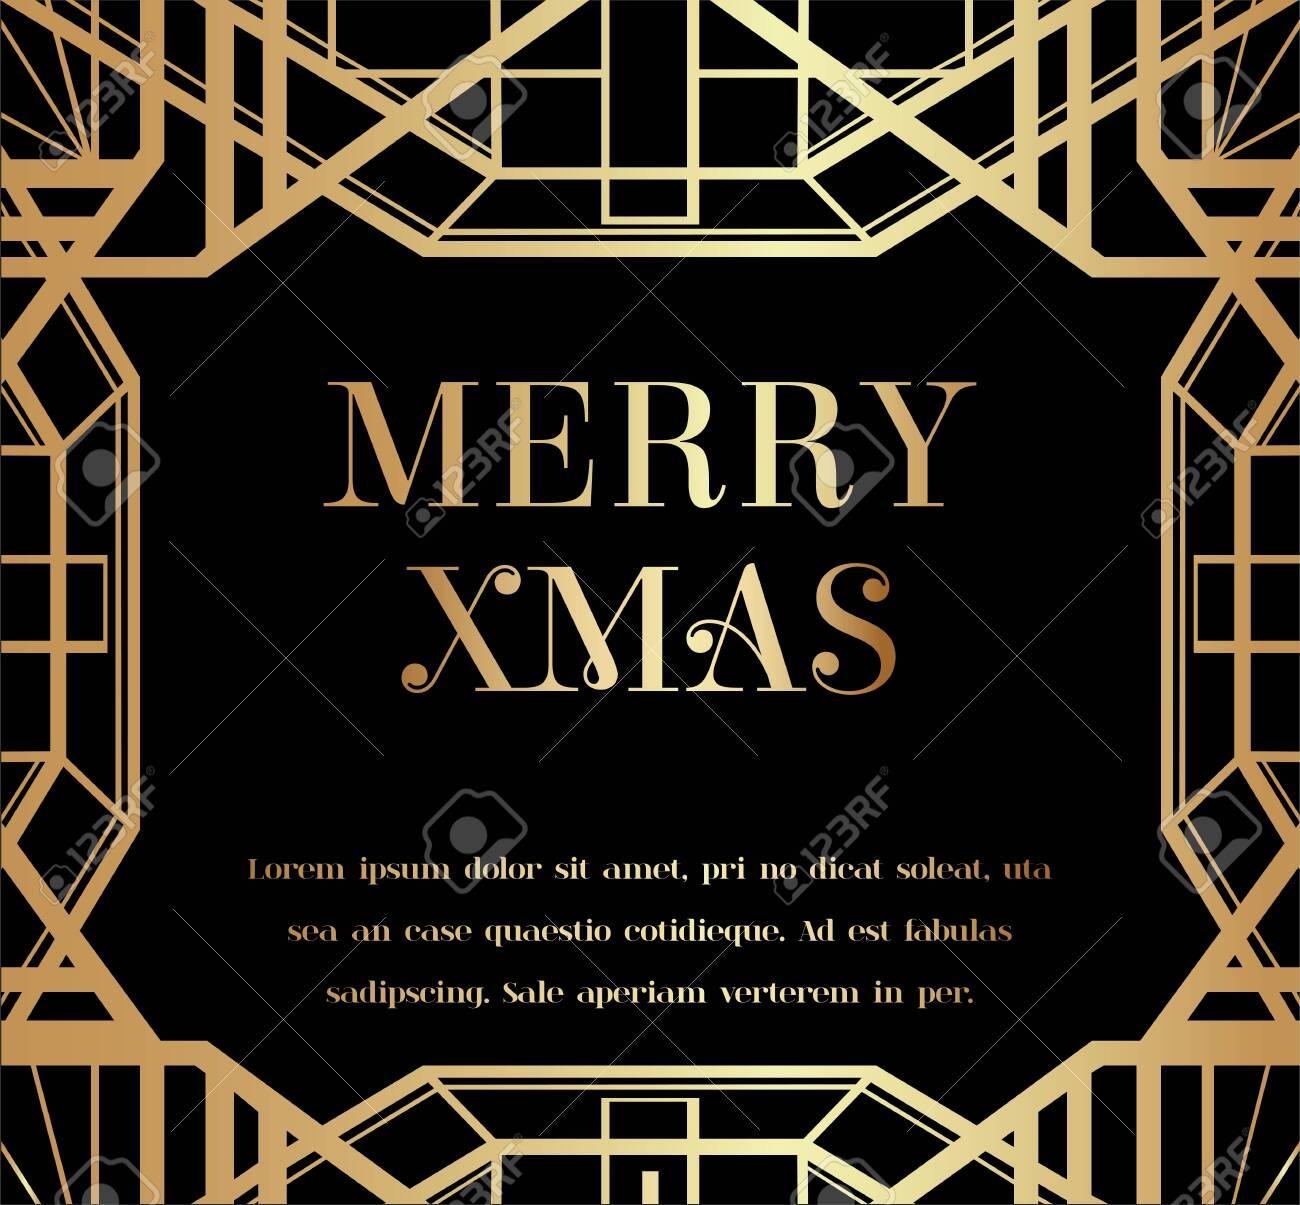 Merry Christmas or Xmas Art Deco Invitation Design - 146601573